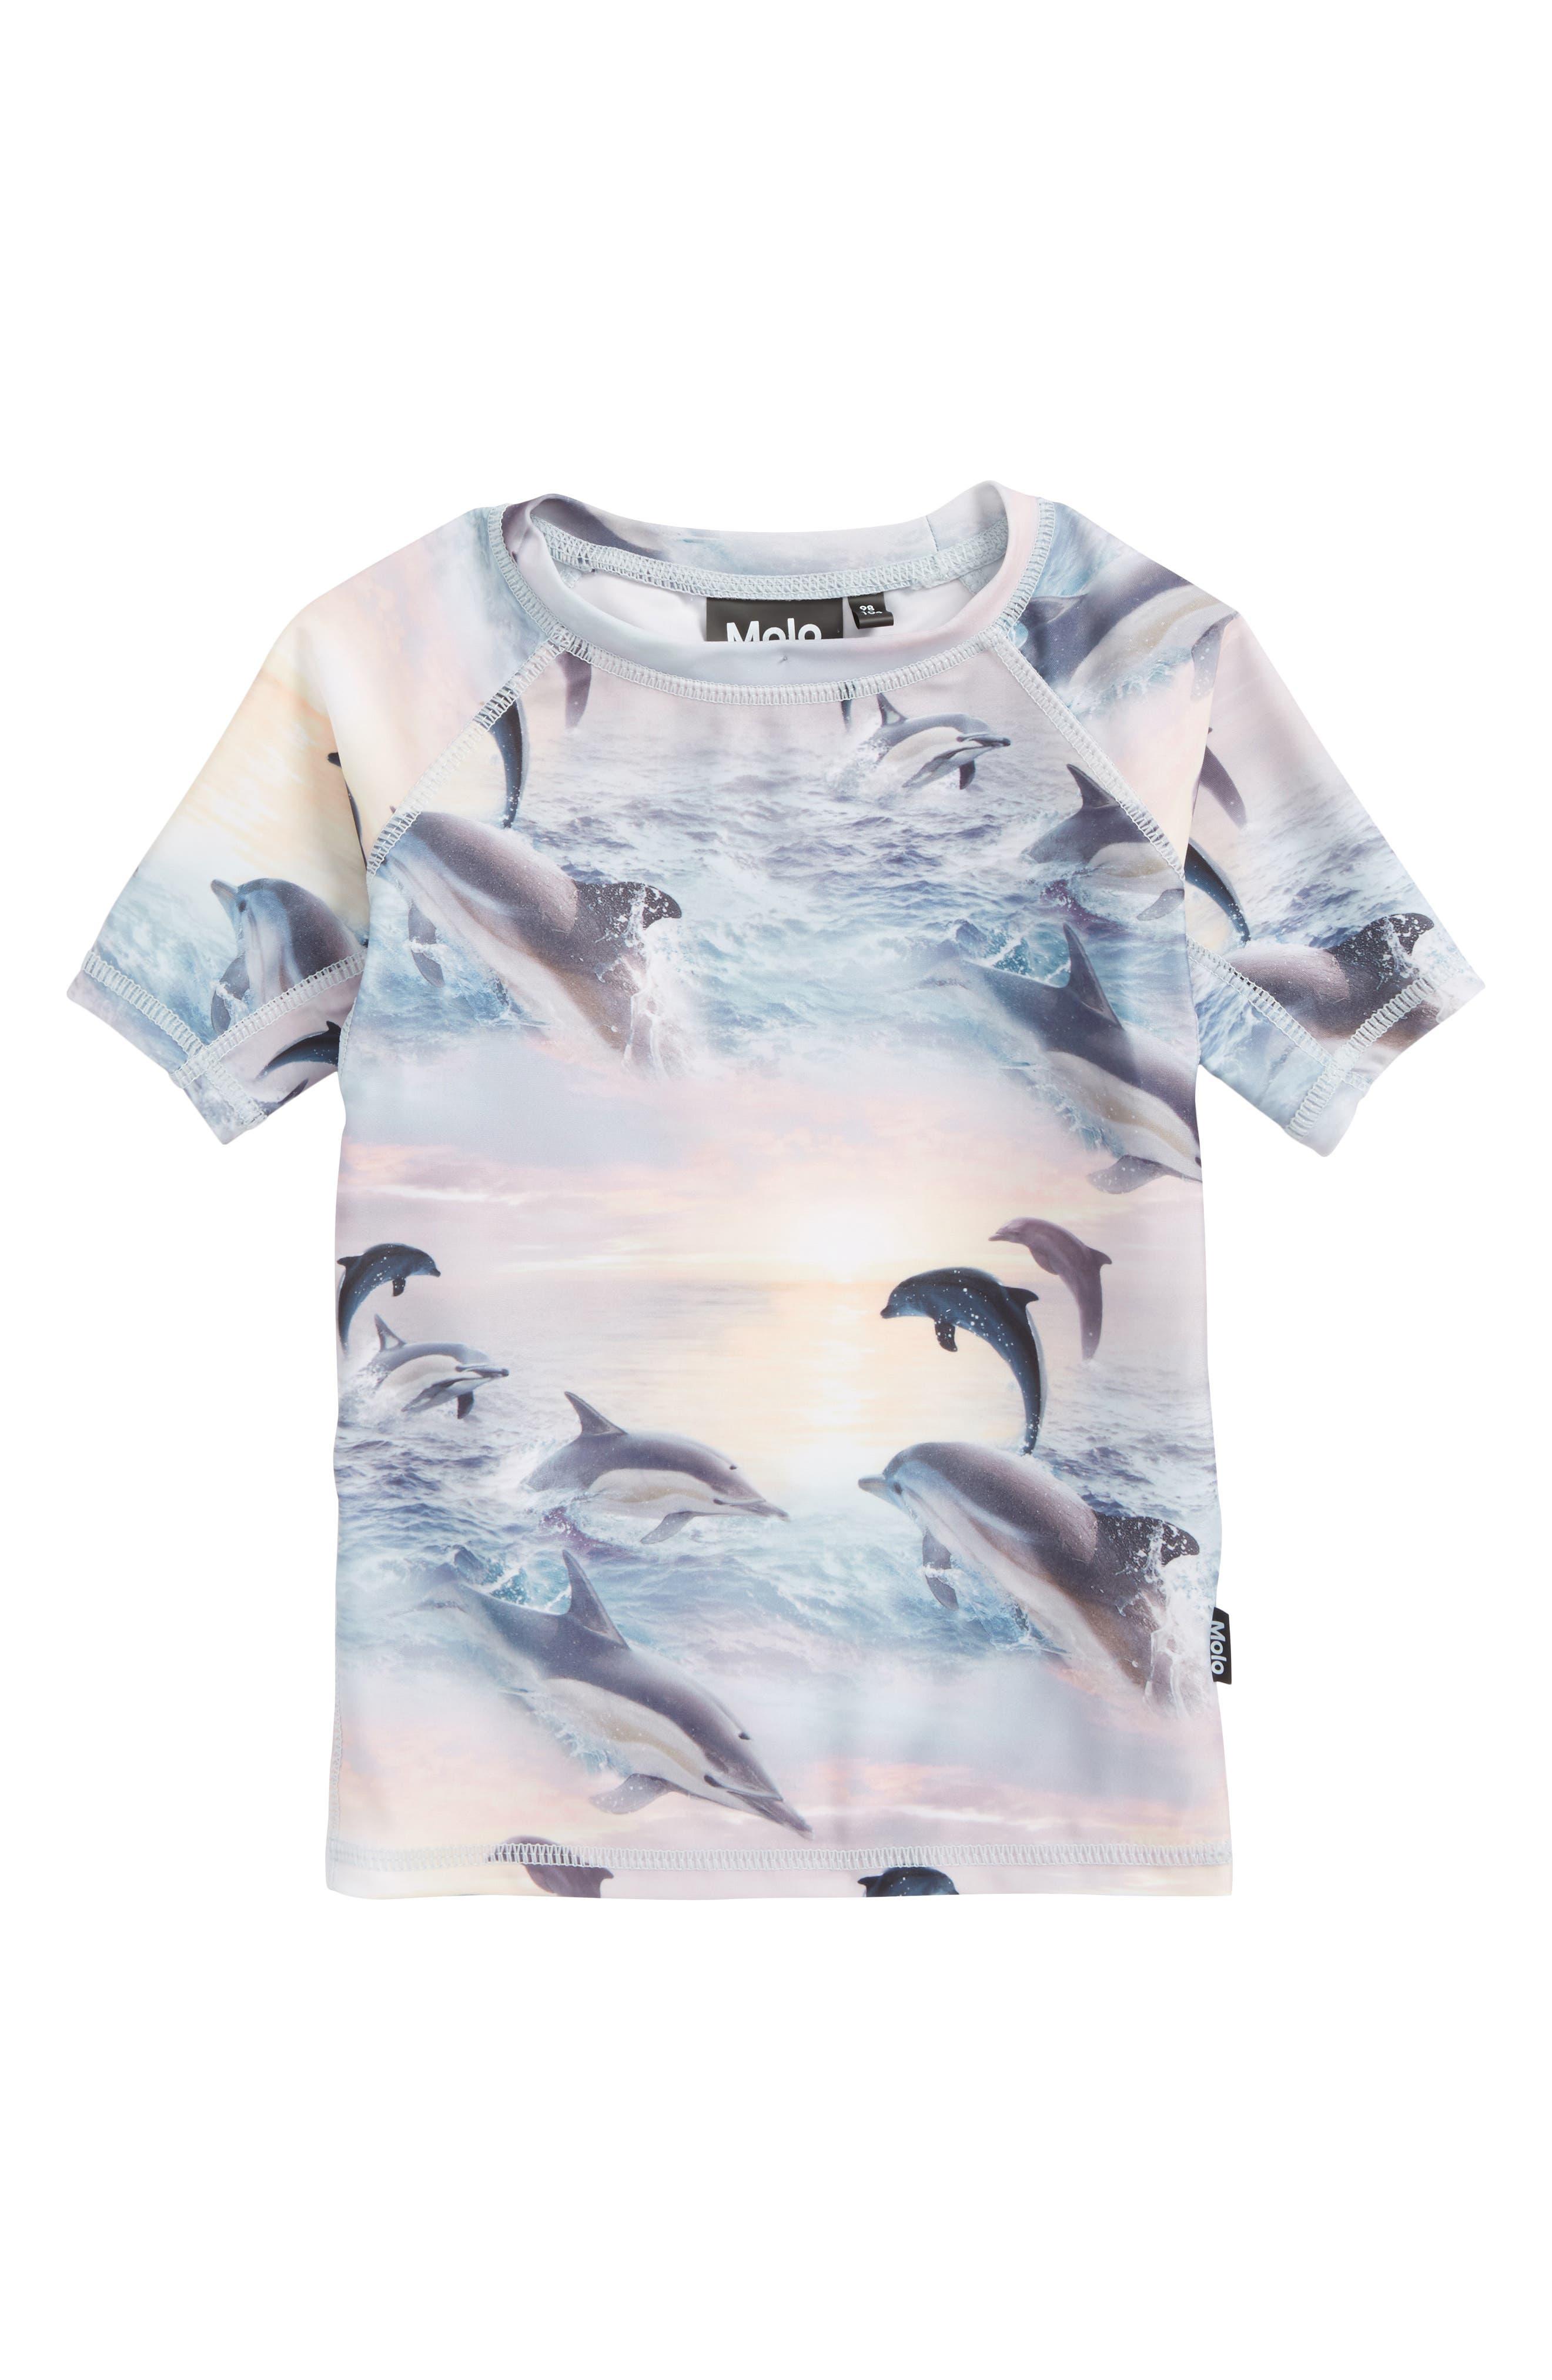 Neptune Short Sleeve Rashguard,                             Main thumbnail 1, color,                             Dolphins Sunset